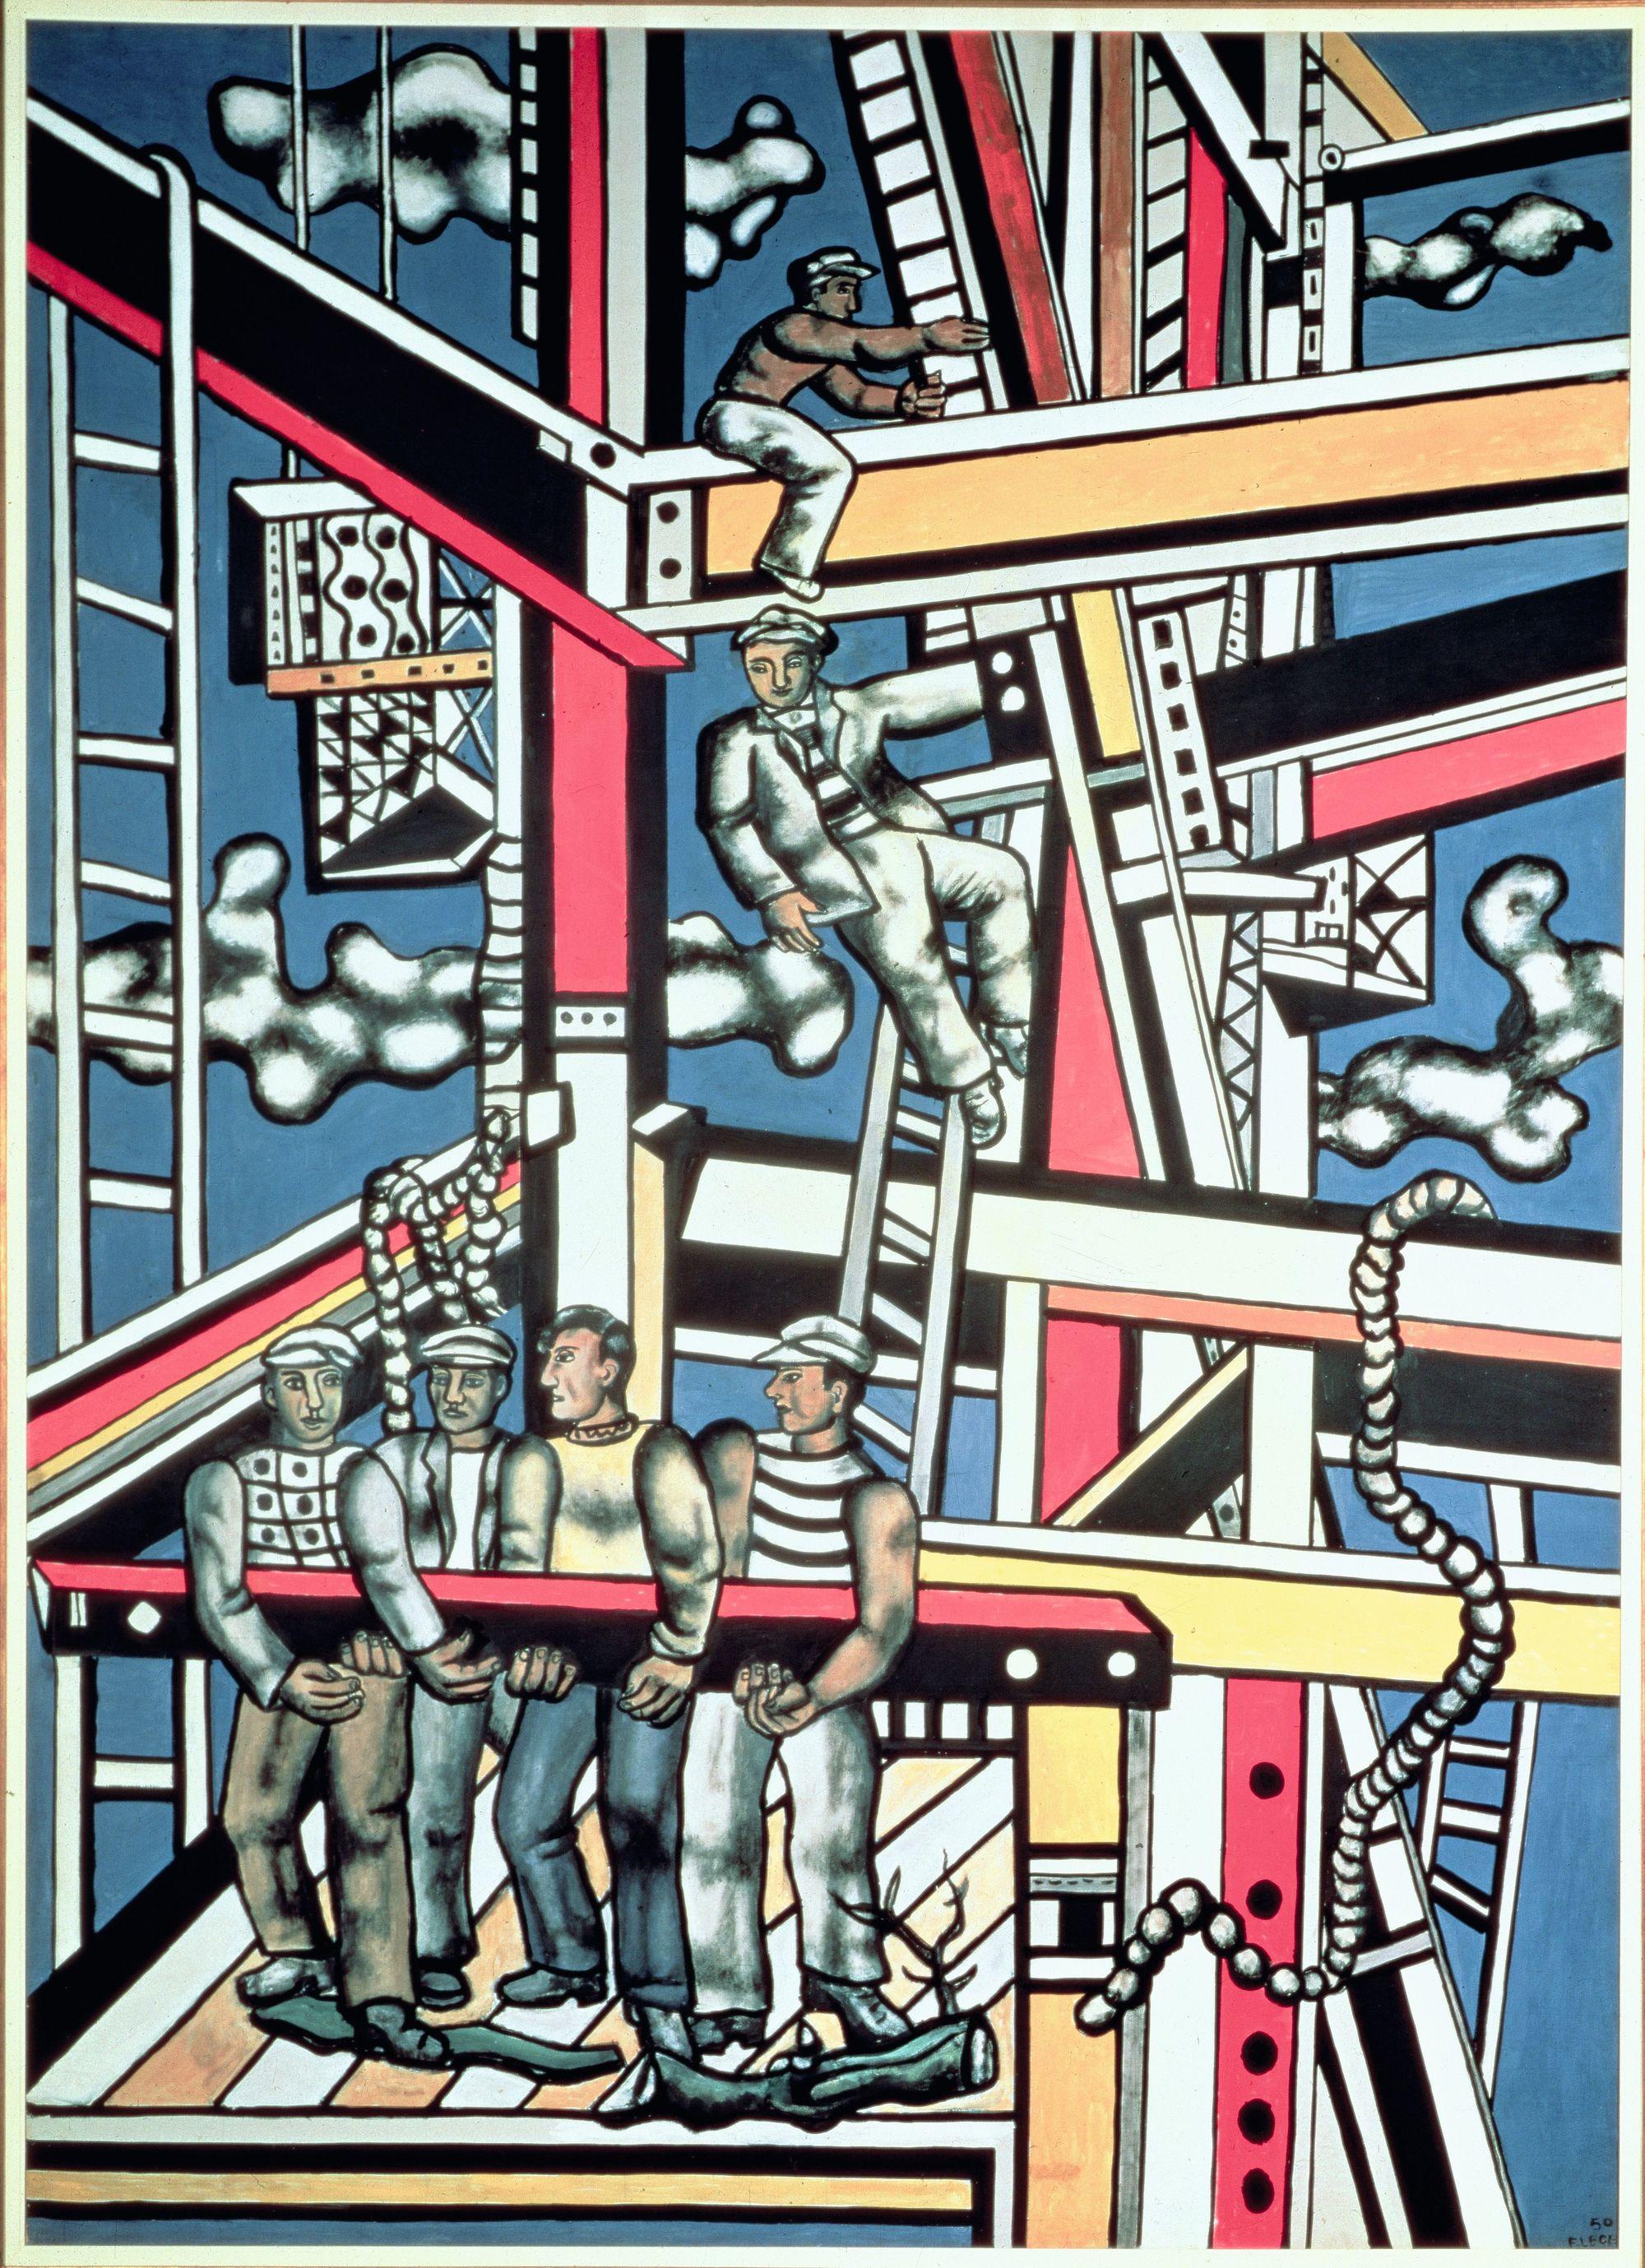 Les Constructeurs, Fernand Léger, 1950.